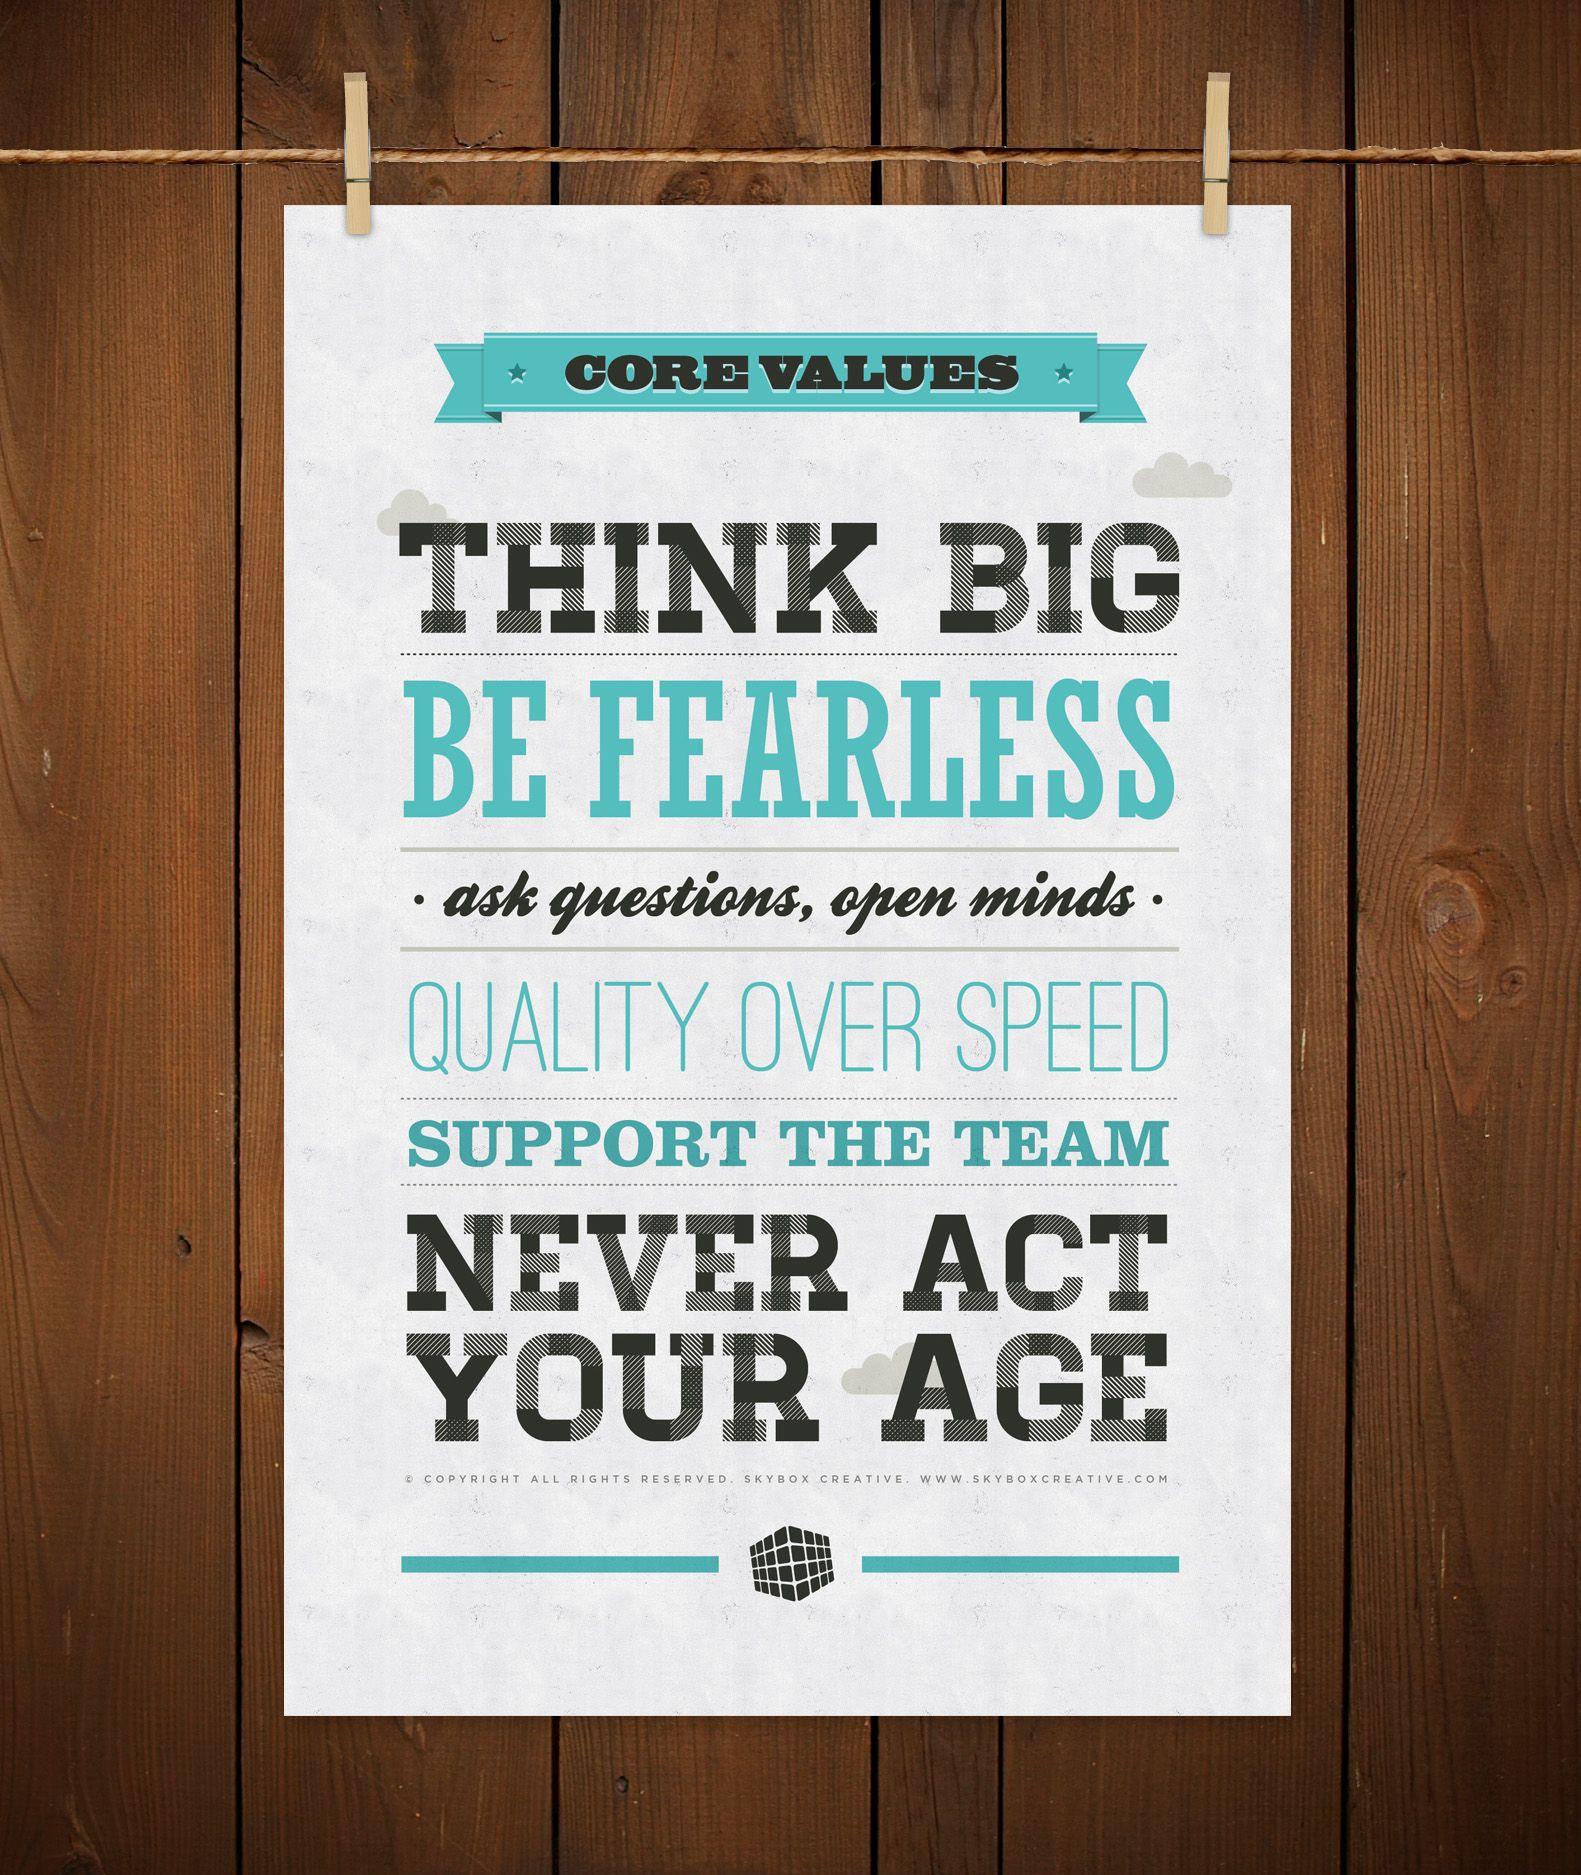 Poster design company - Skybox Creative Core Values Poster Design